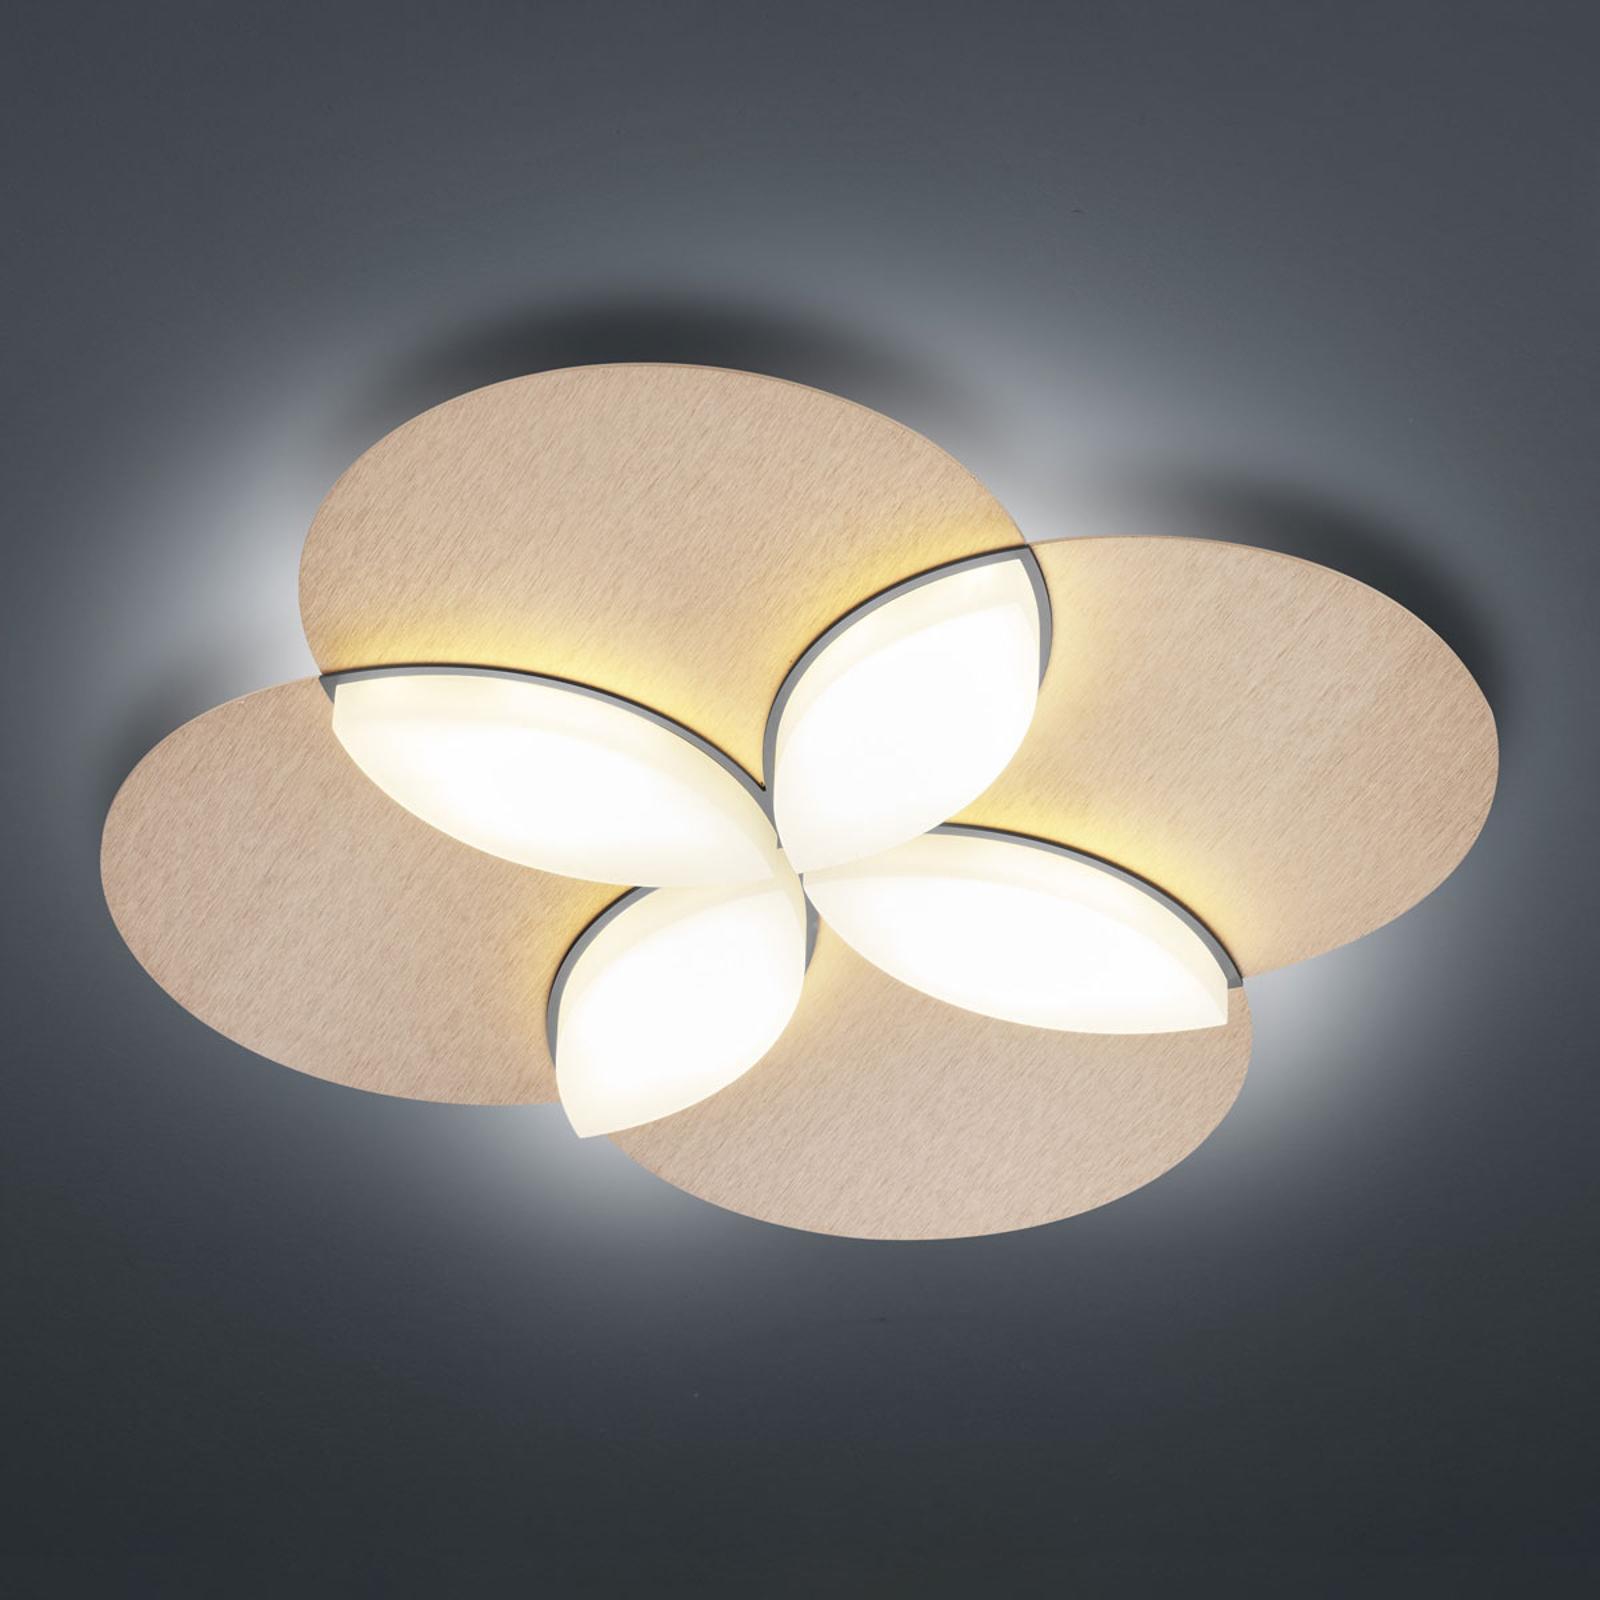 BANKAMP Spring lampa sufitowa LED, różowe złoto